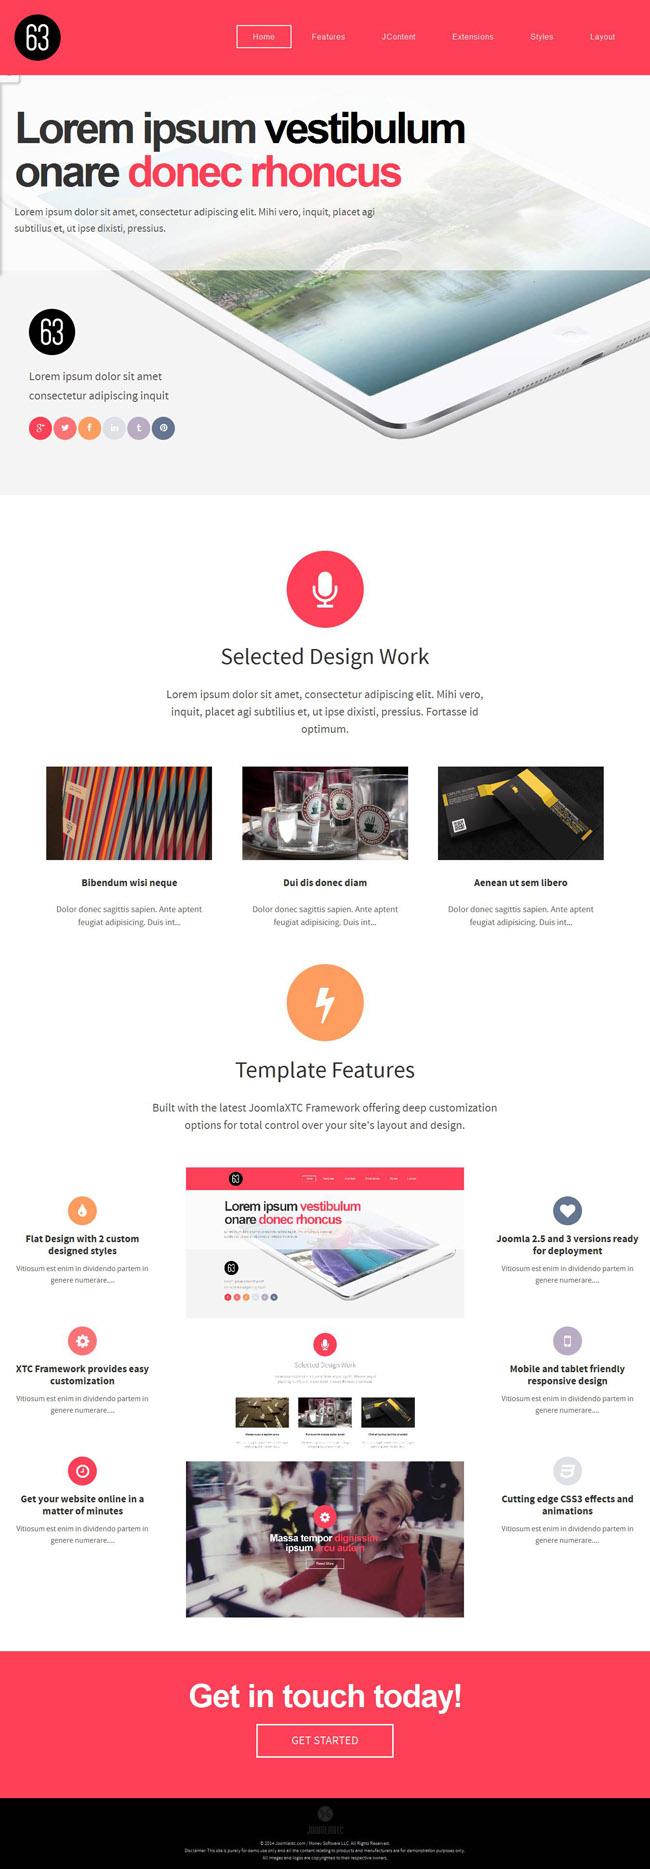 63-Agency-Joomla-Template-business